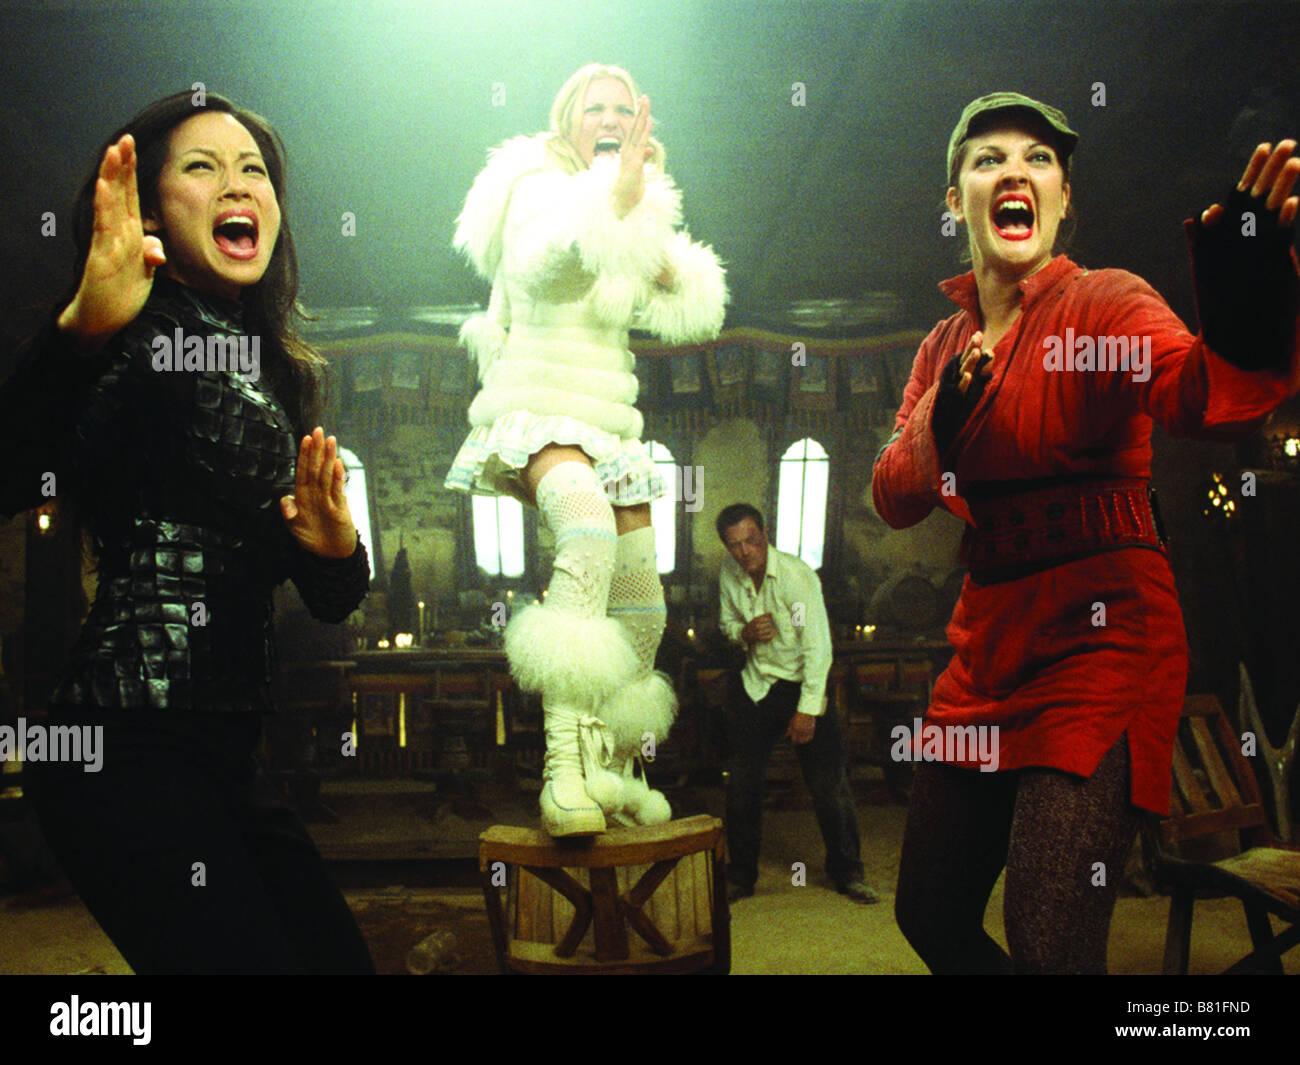 Charlie's Angels: Full Throttle  Year: 2003 USA Lucy Liu, Cameron Diaz, Drew Barrymore  Director: McG - Stock Image